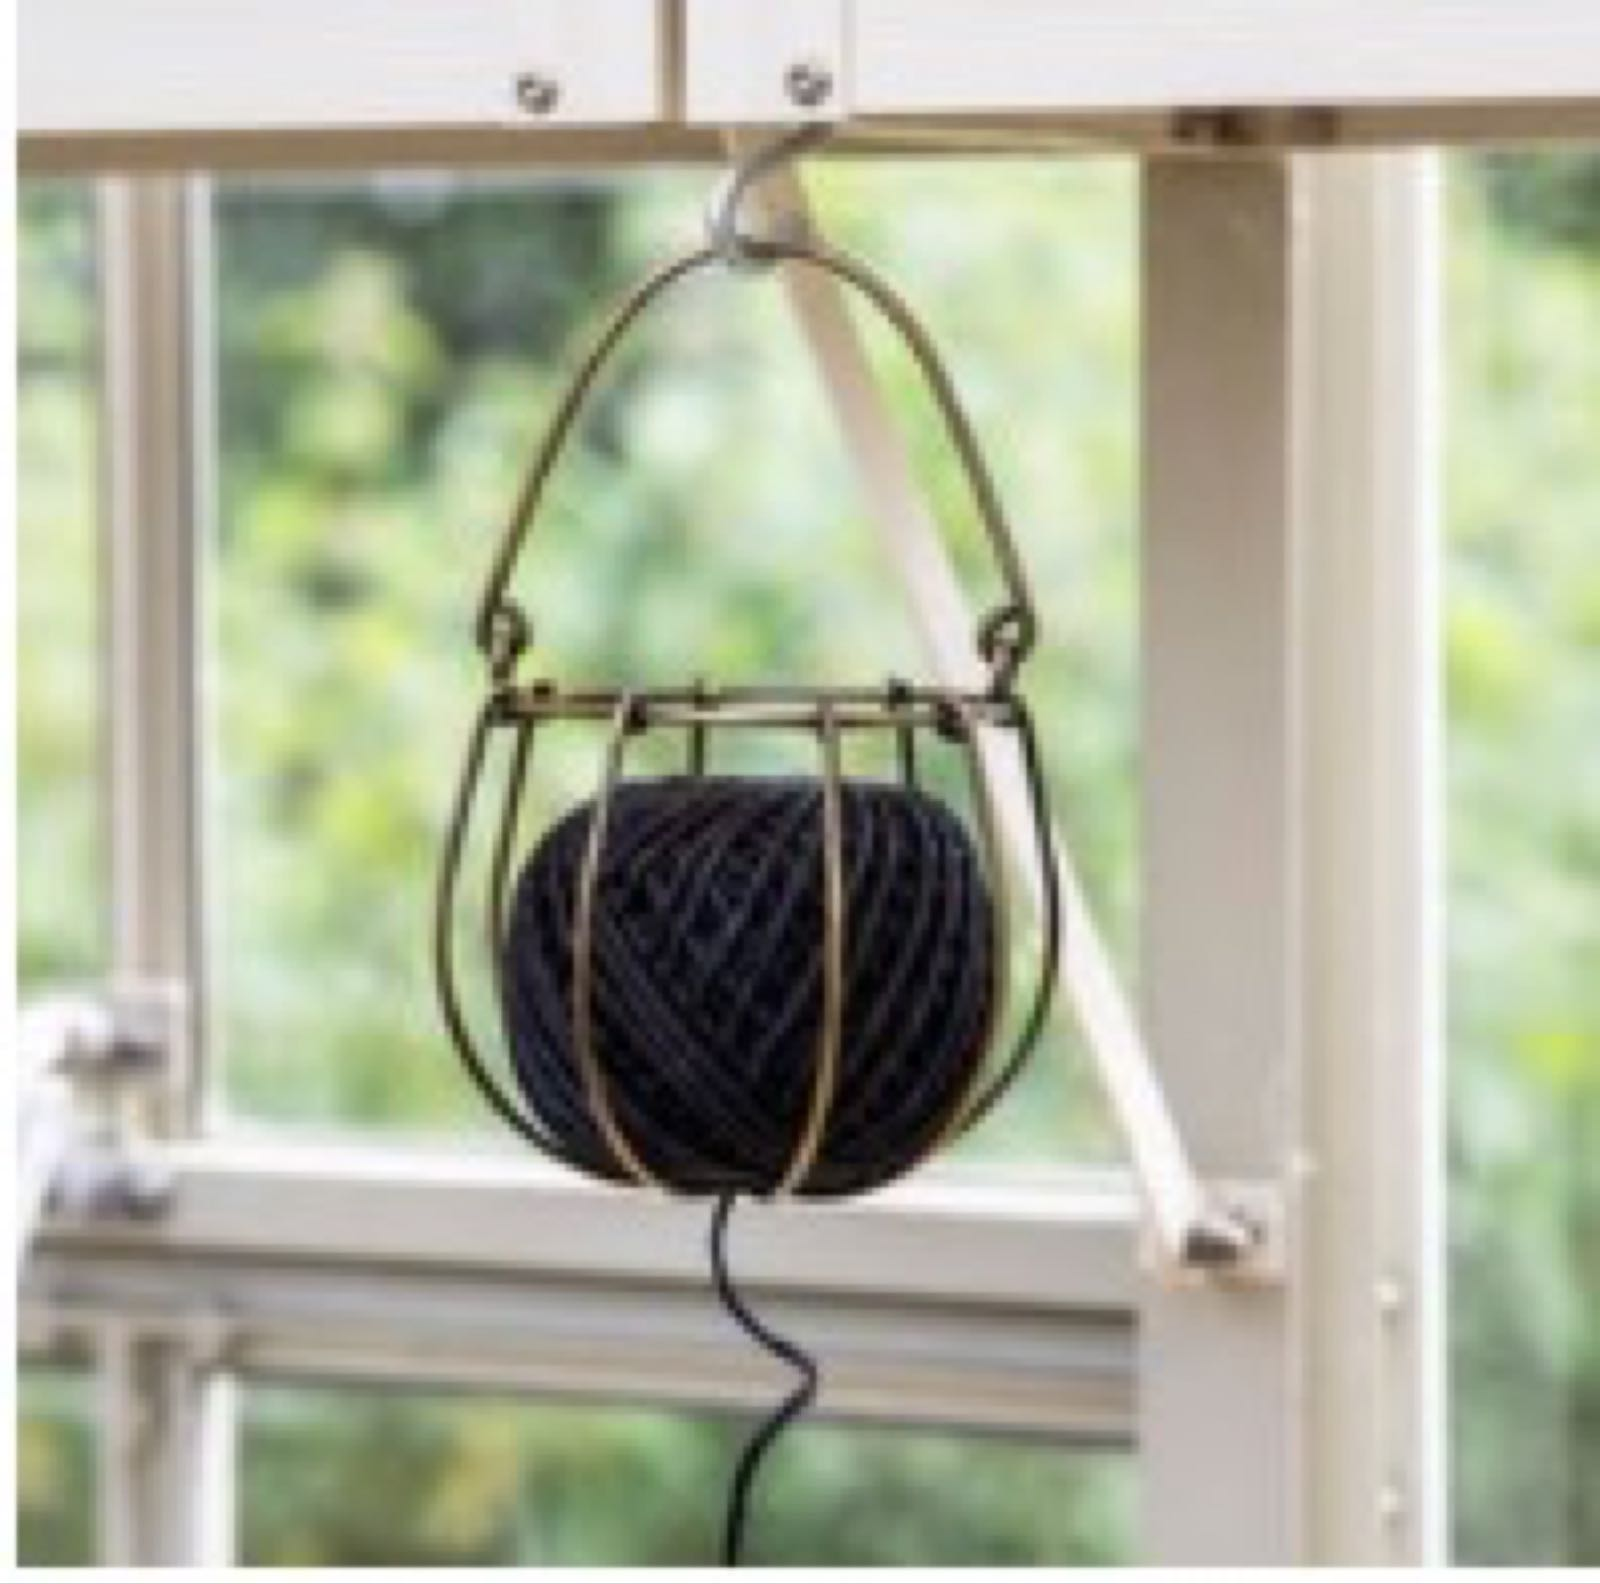 Wirework string holder with string